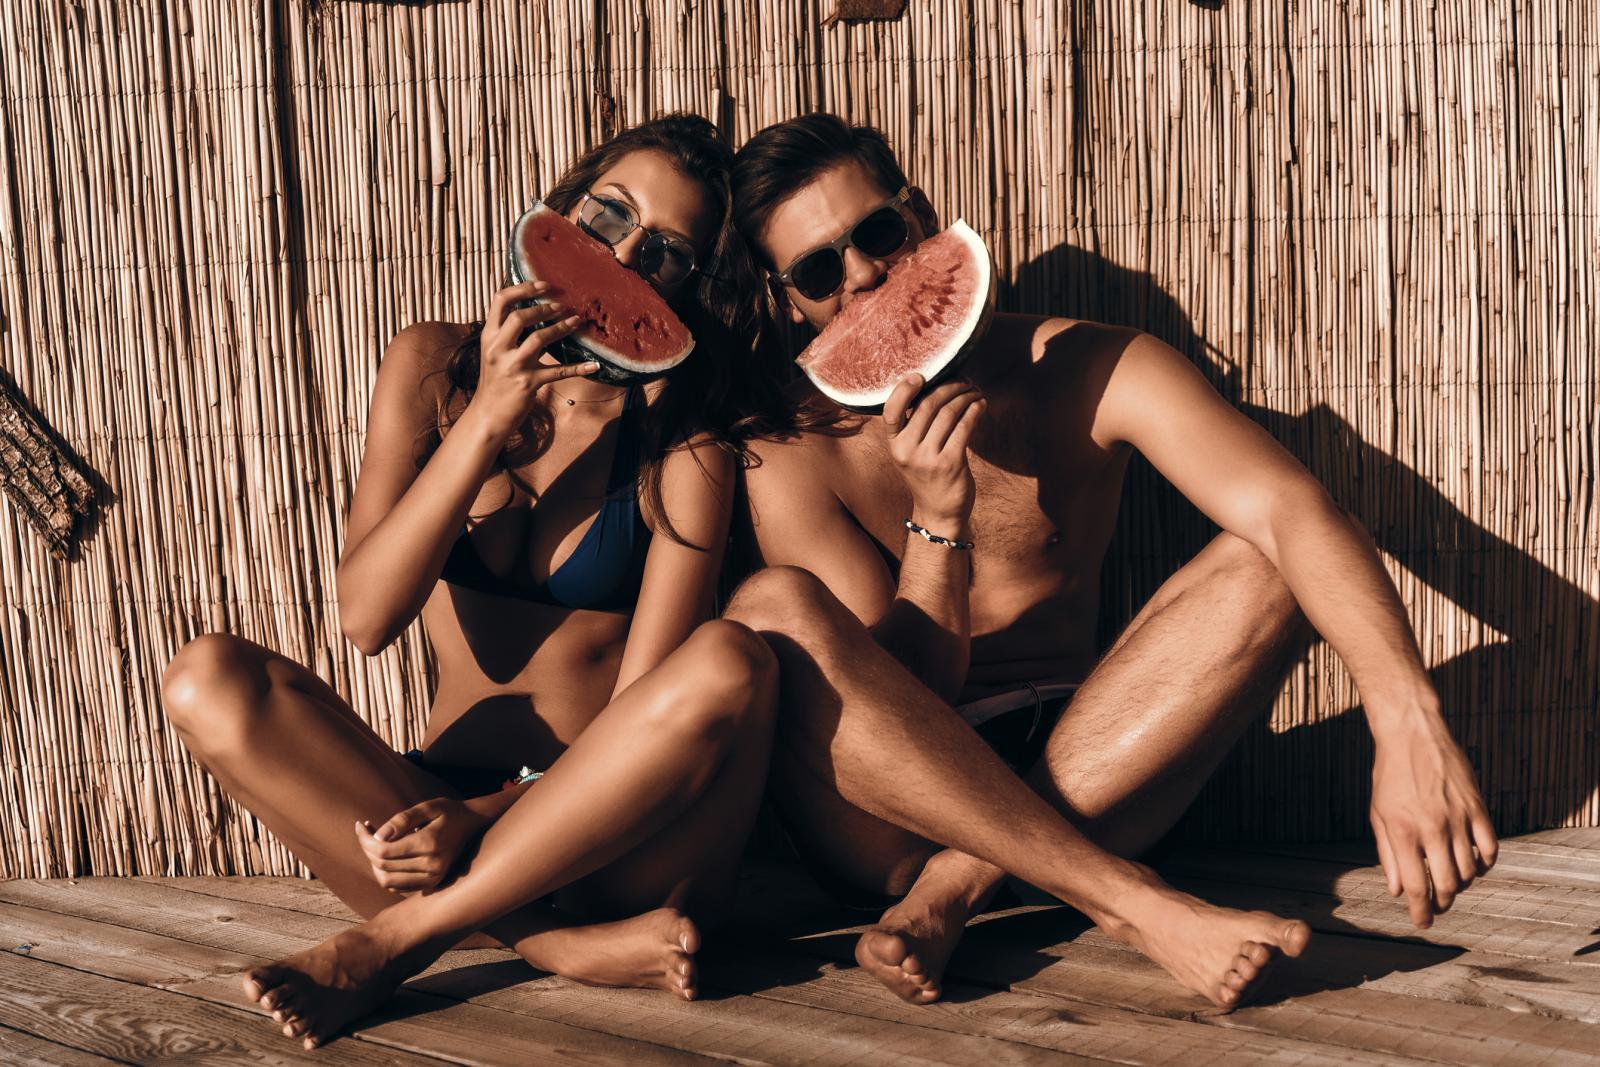 Lubenice su bogate vitaminima, mineralima i antioksidansima te imaju vrlo malo kalorija.